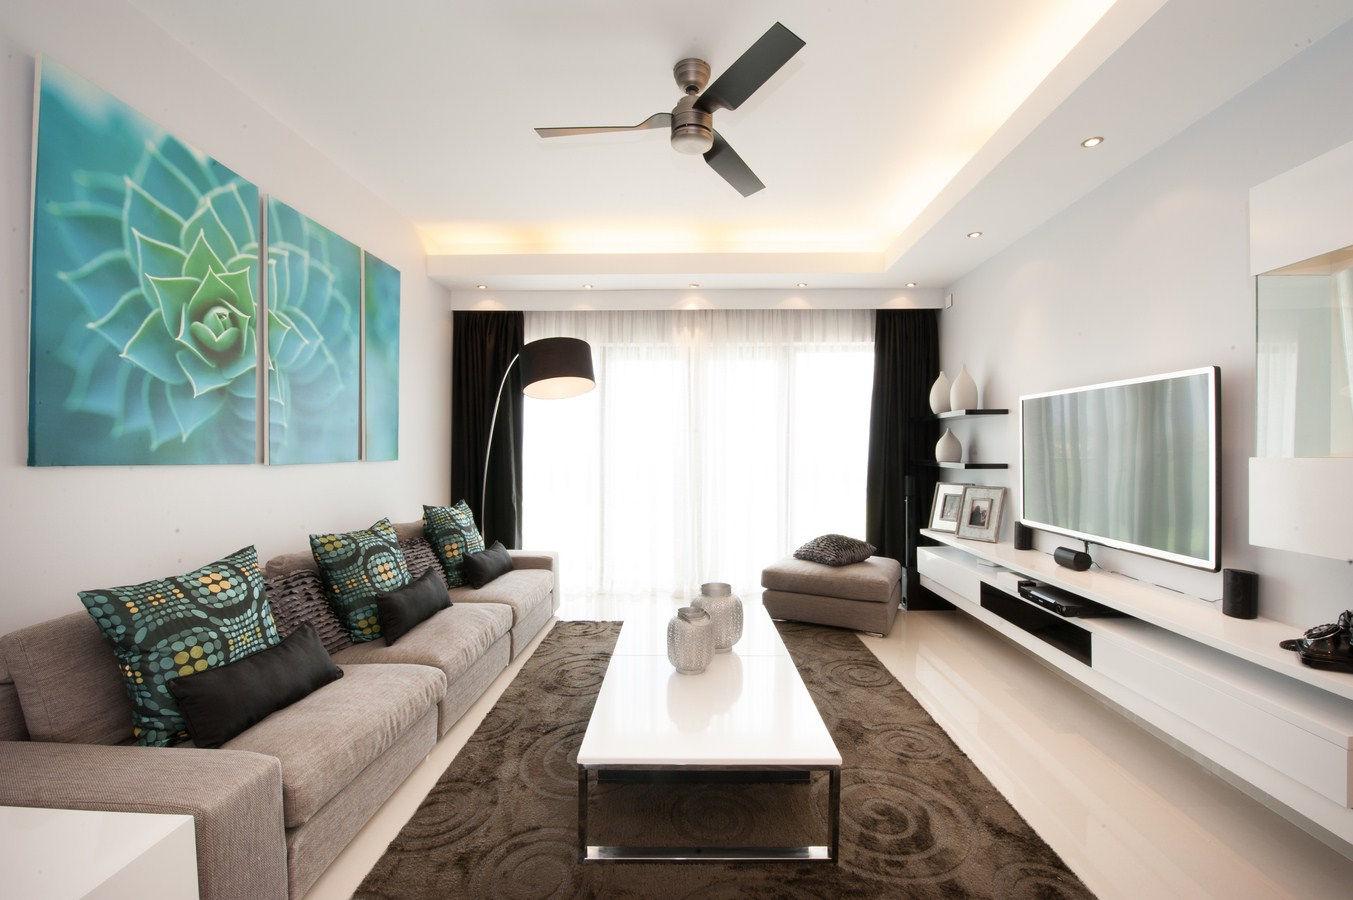 Interior design and decoration Mauritius, De la Haye Interiors ... - ^